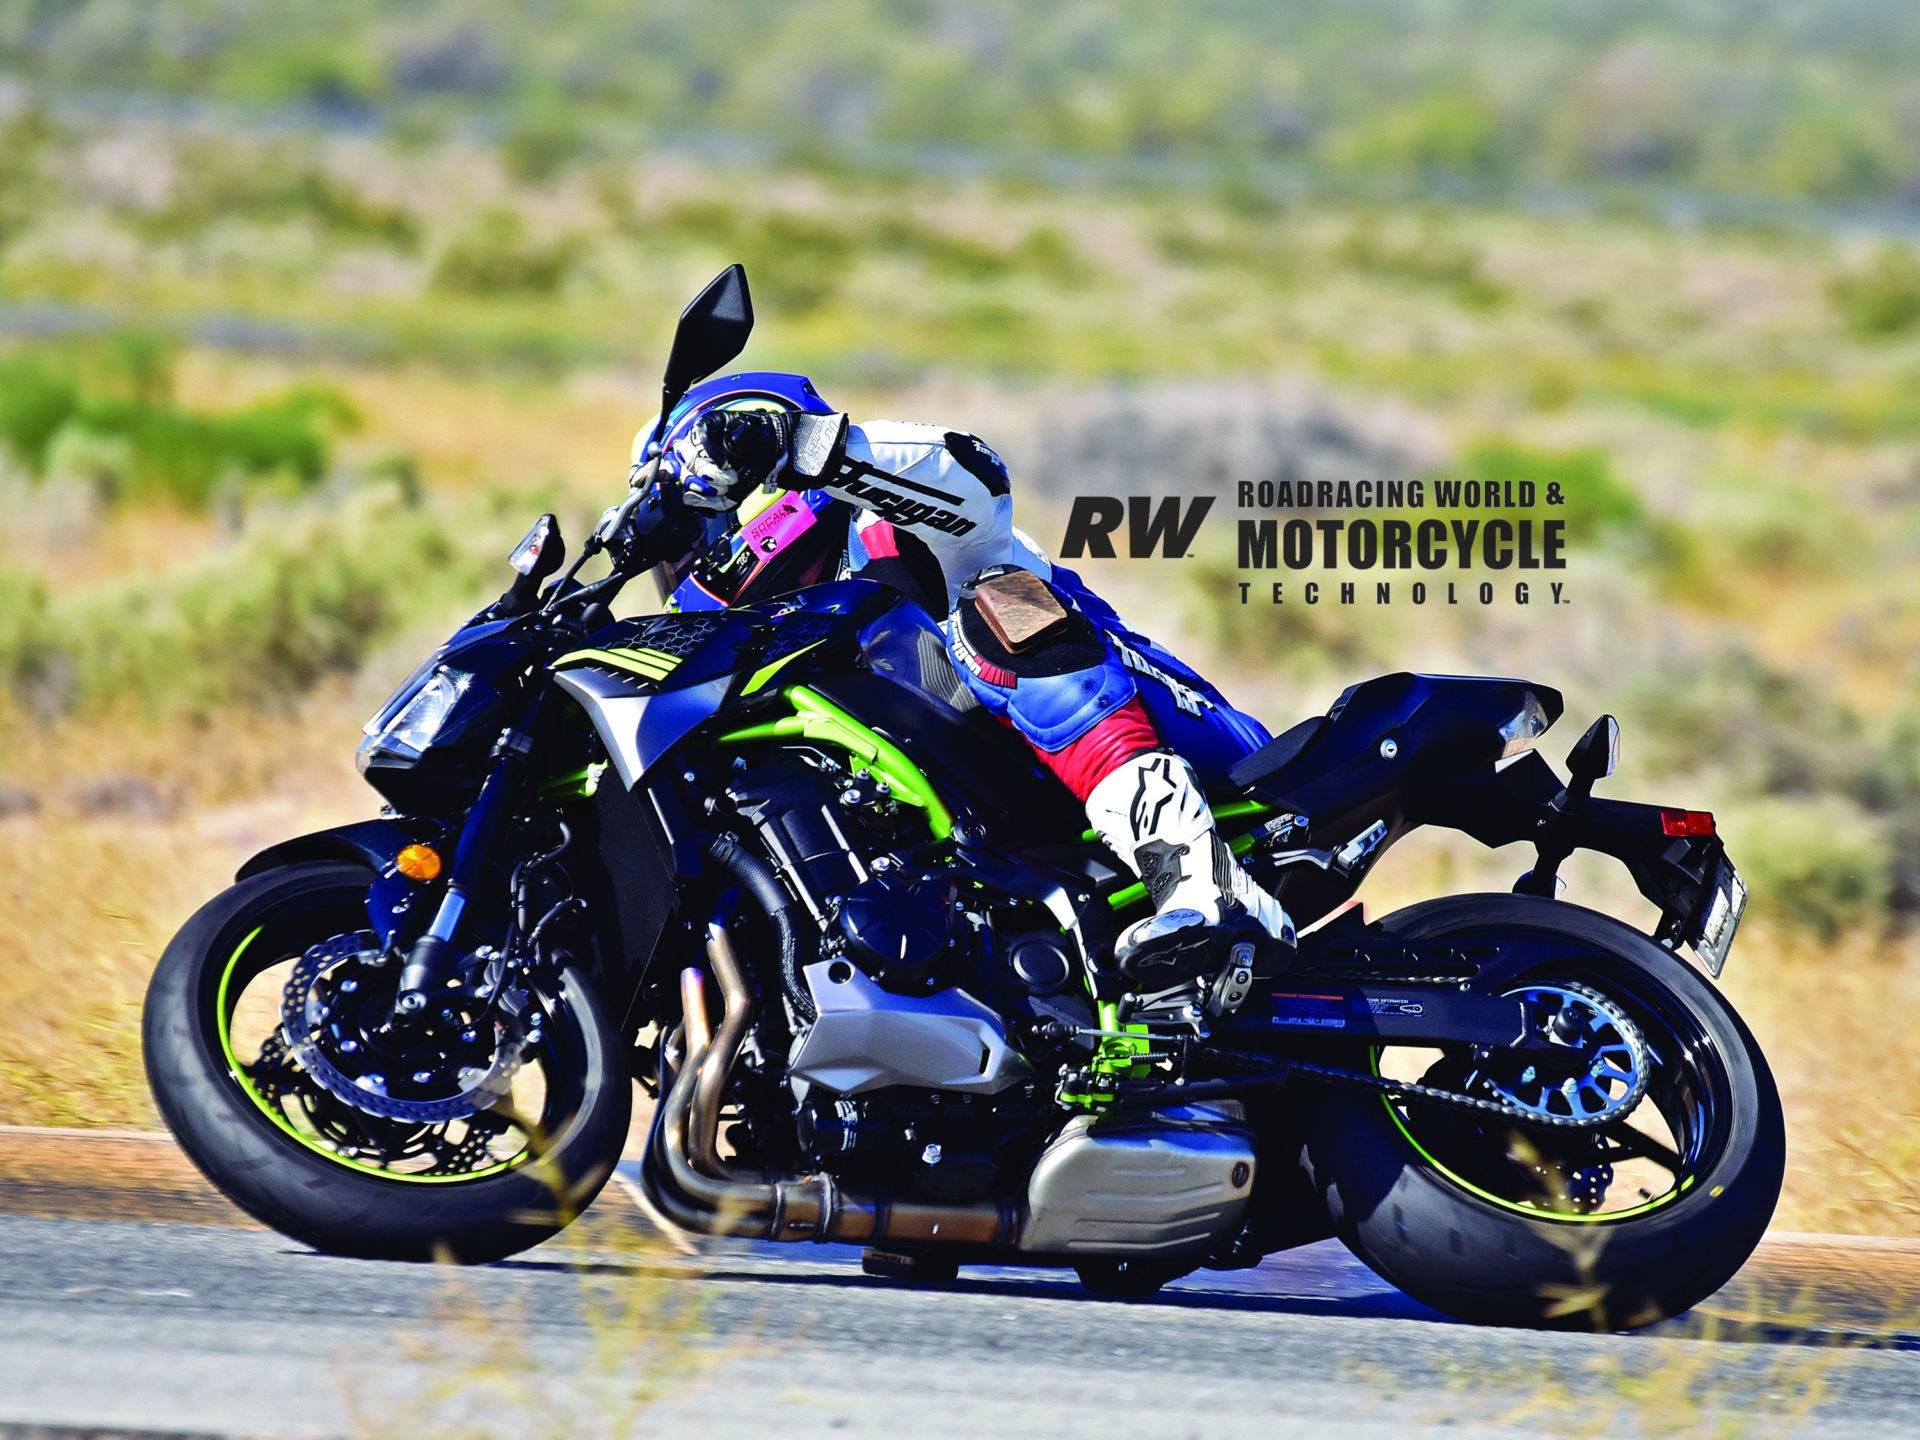 The Kawasaki Z900 has enough power to be entertaining. Chris Ulrich demonstrates. Photos by Michael Gougis.